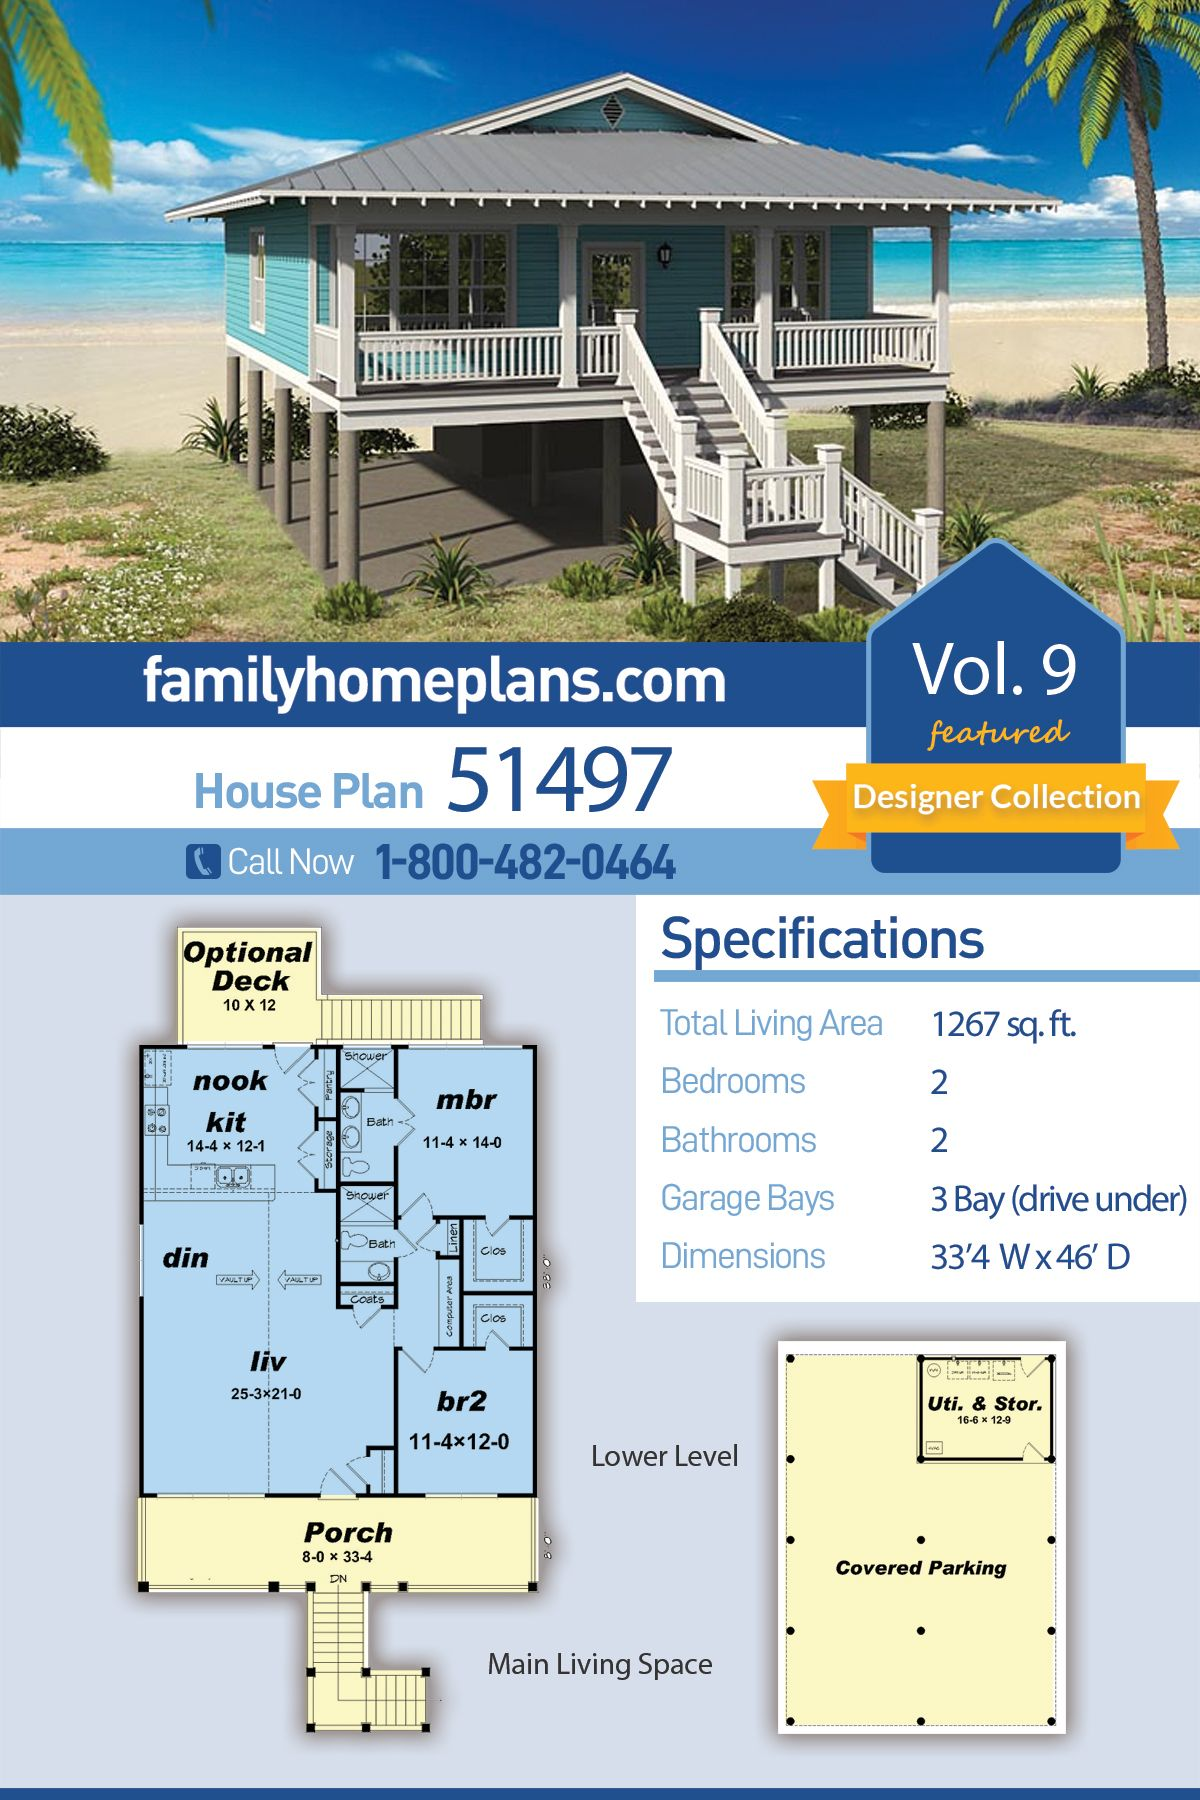 Southern Style House Plan 51497 With 2 Bed 2 Bath 3 Car Garage Beach House Floor Plans Family House Plans Beach House Plans